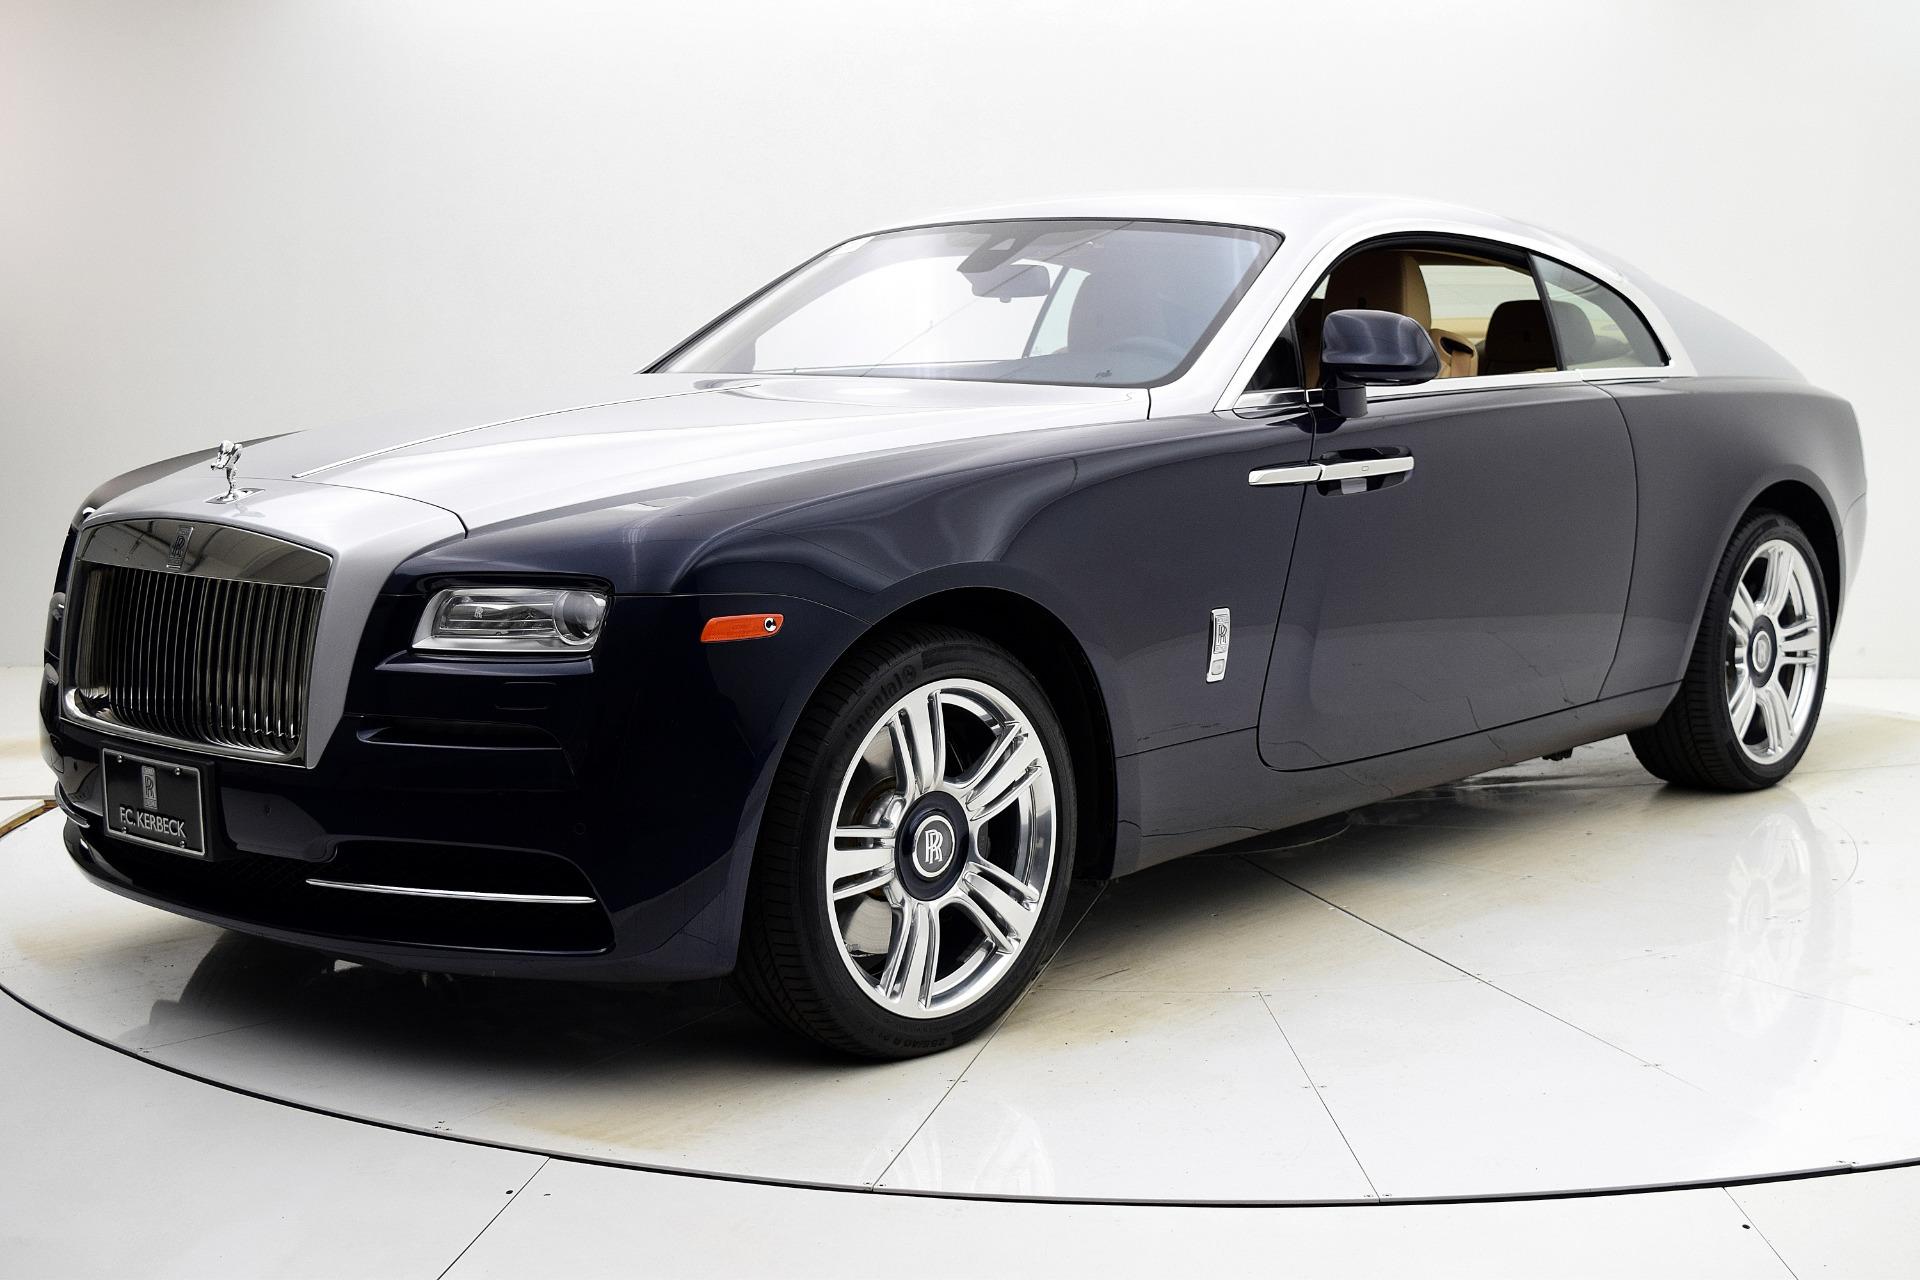 Used 2015 Rolls-Royce Wraith for sale $194,880 at Bentley Palmyra N.J. in Palmyra NJ 08065 2